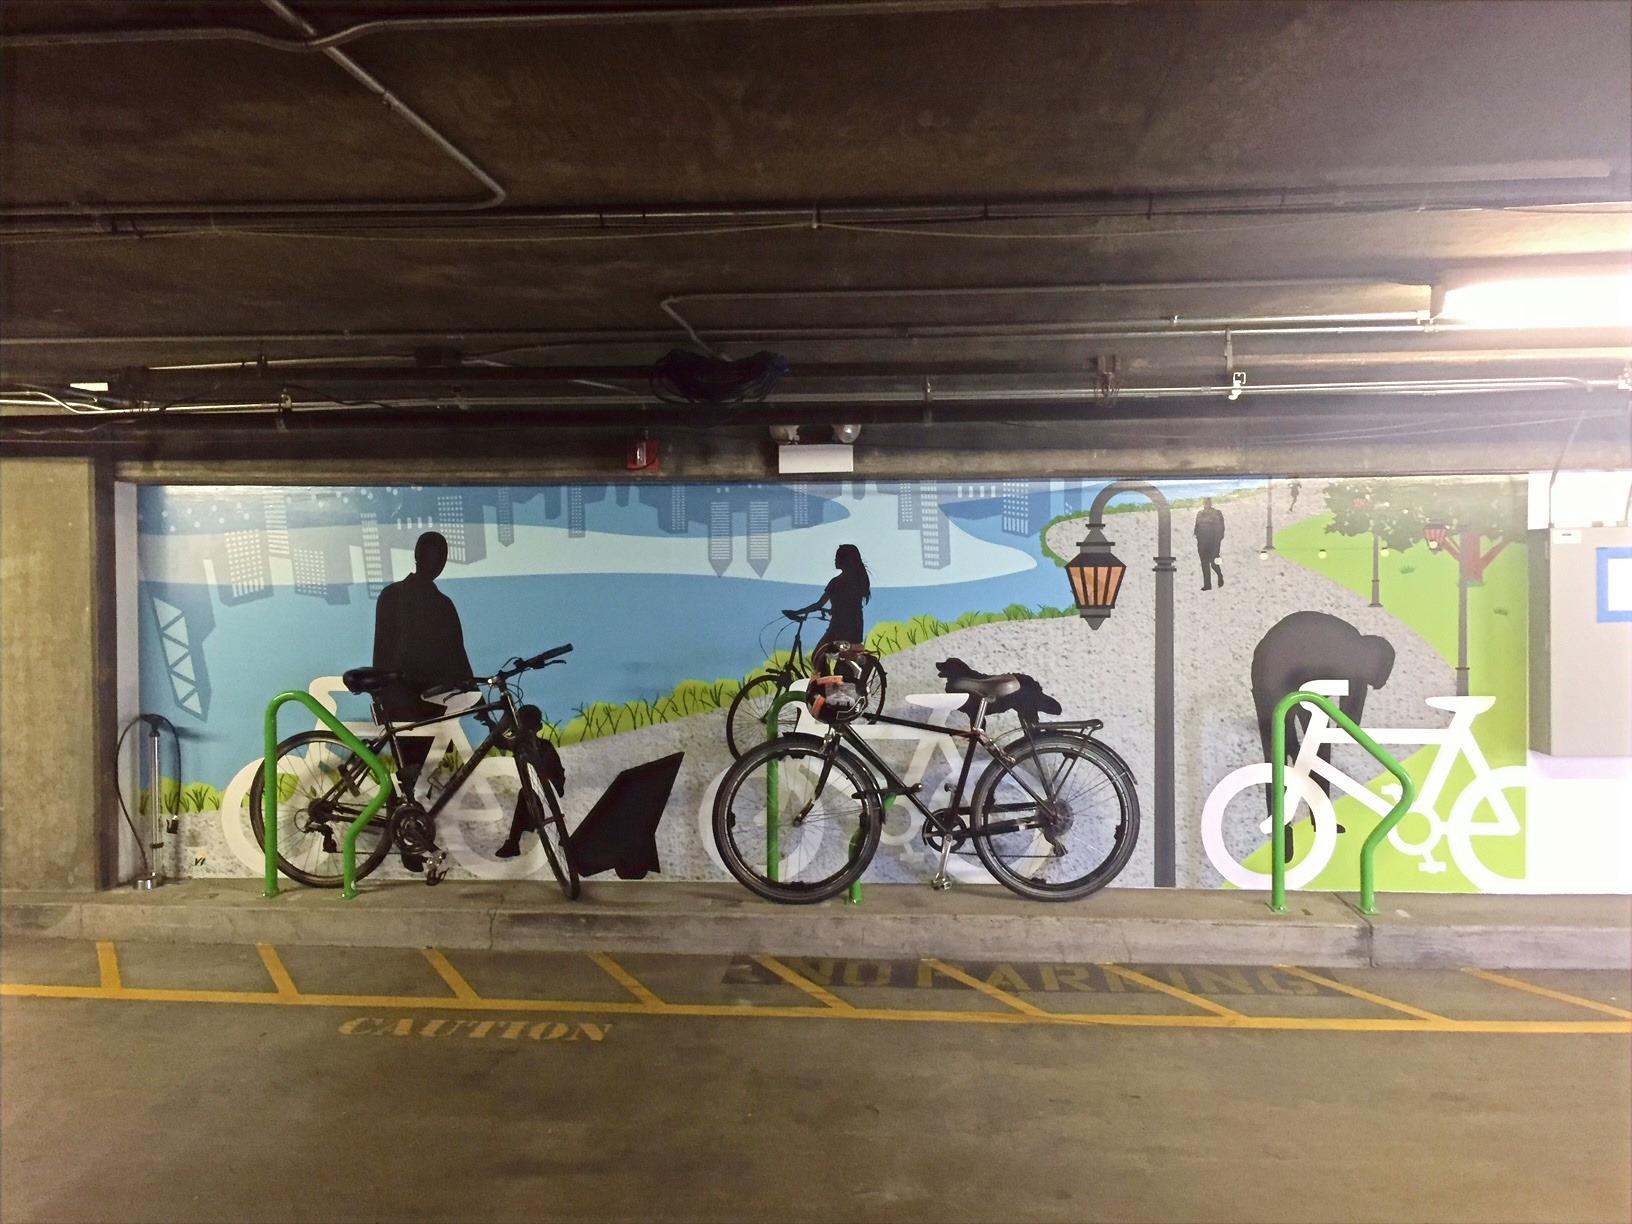 Wall Mural Graphics